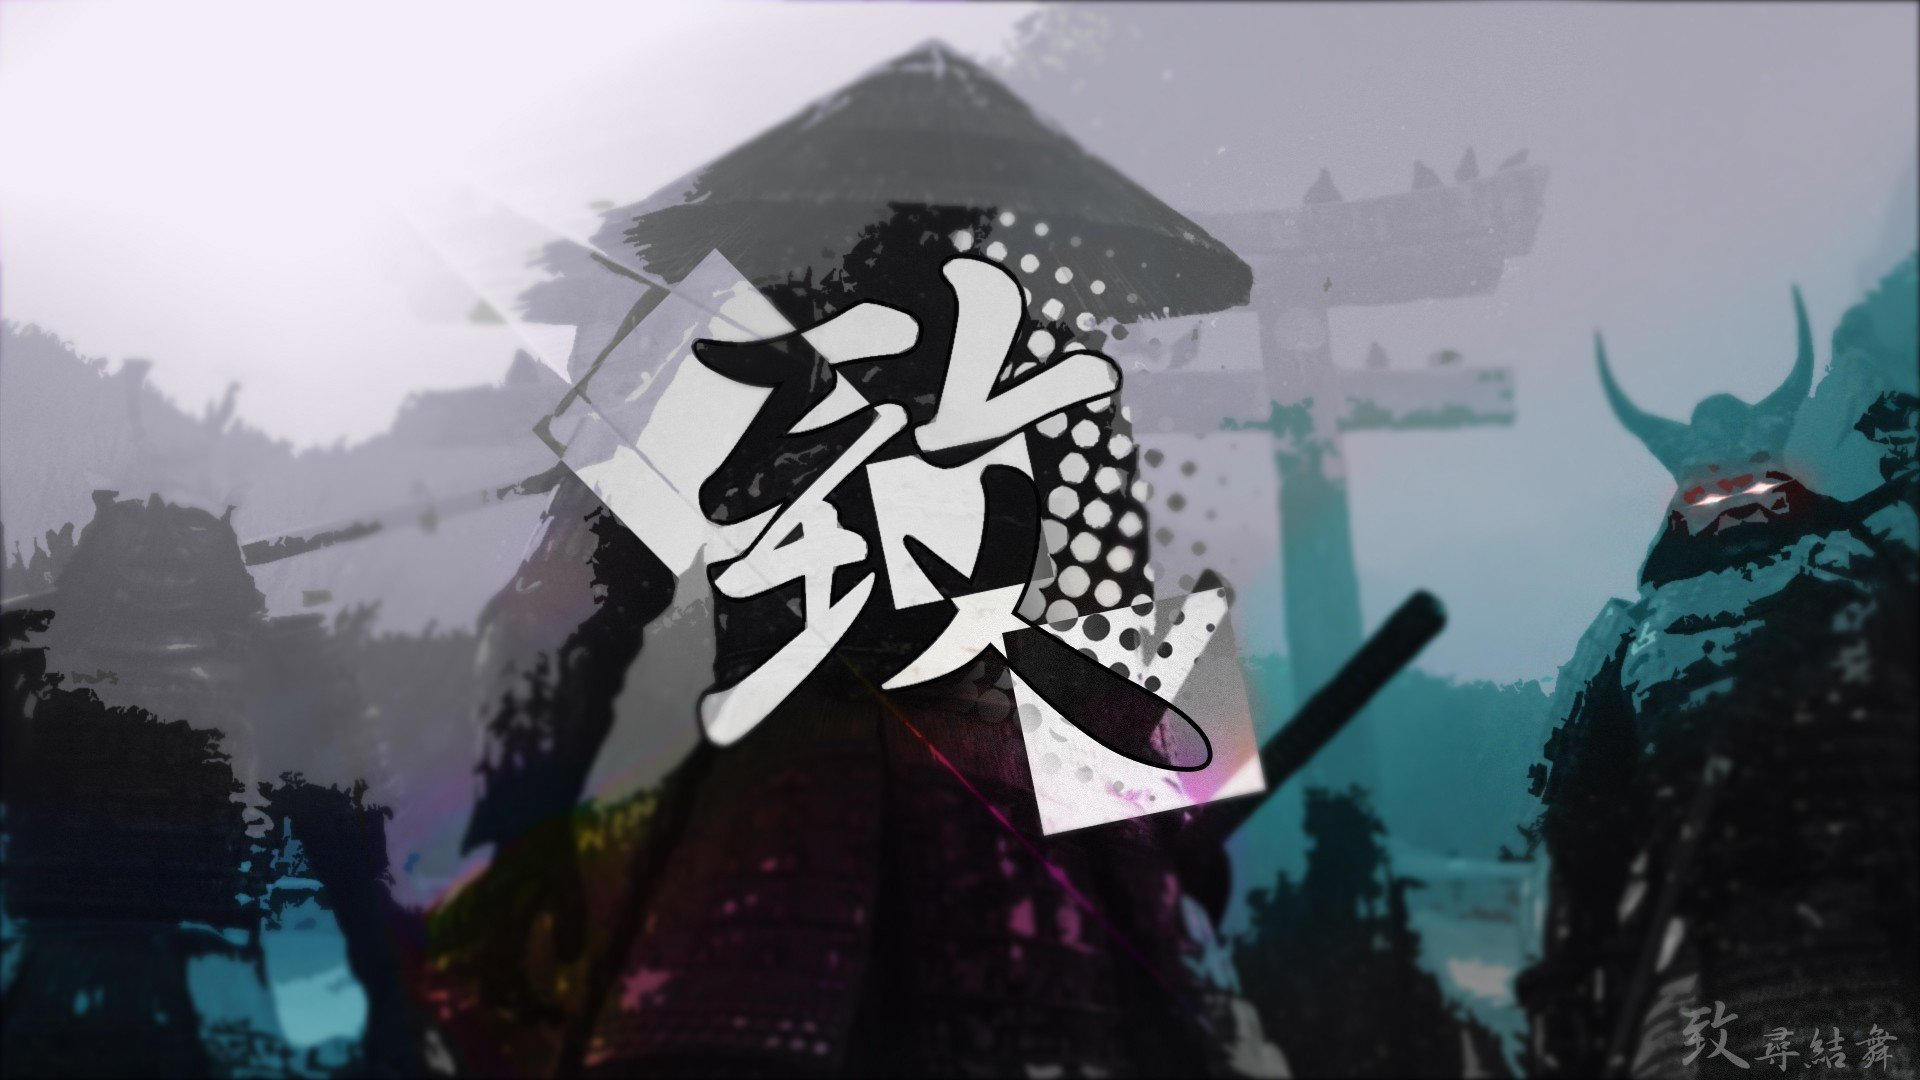 Sucker Punch, Black, Japanese, Japanese Art HD Wallpapers